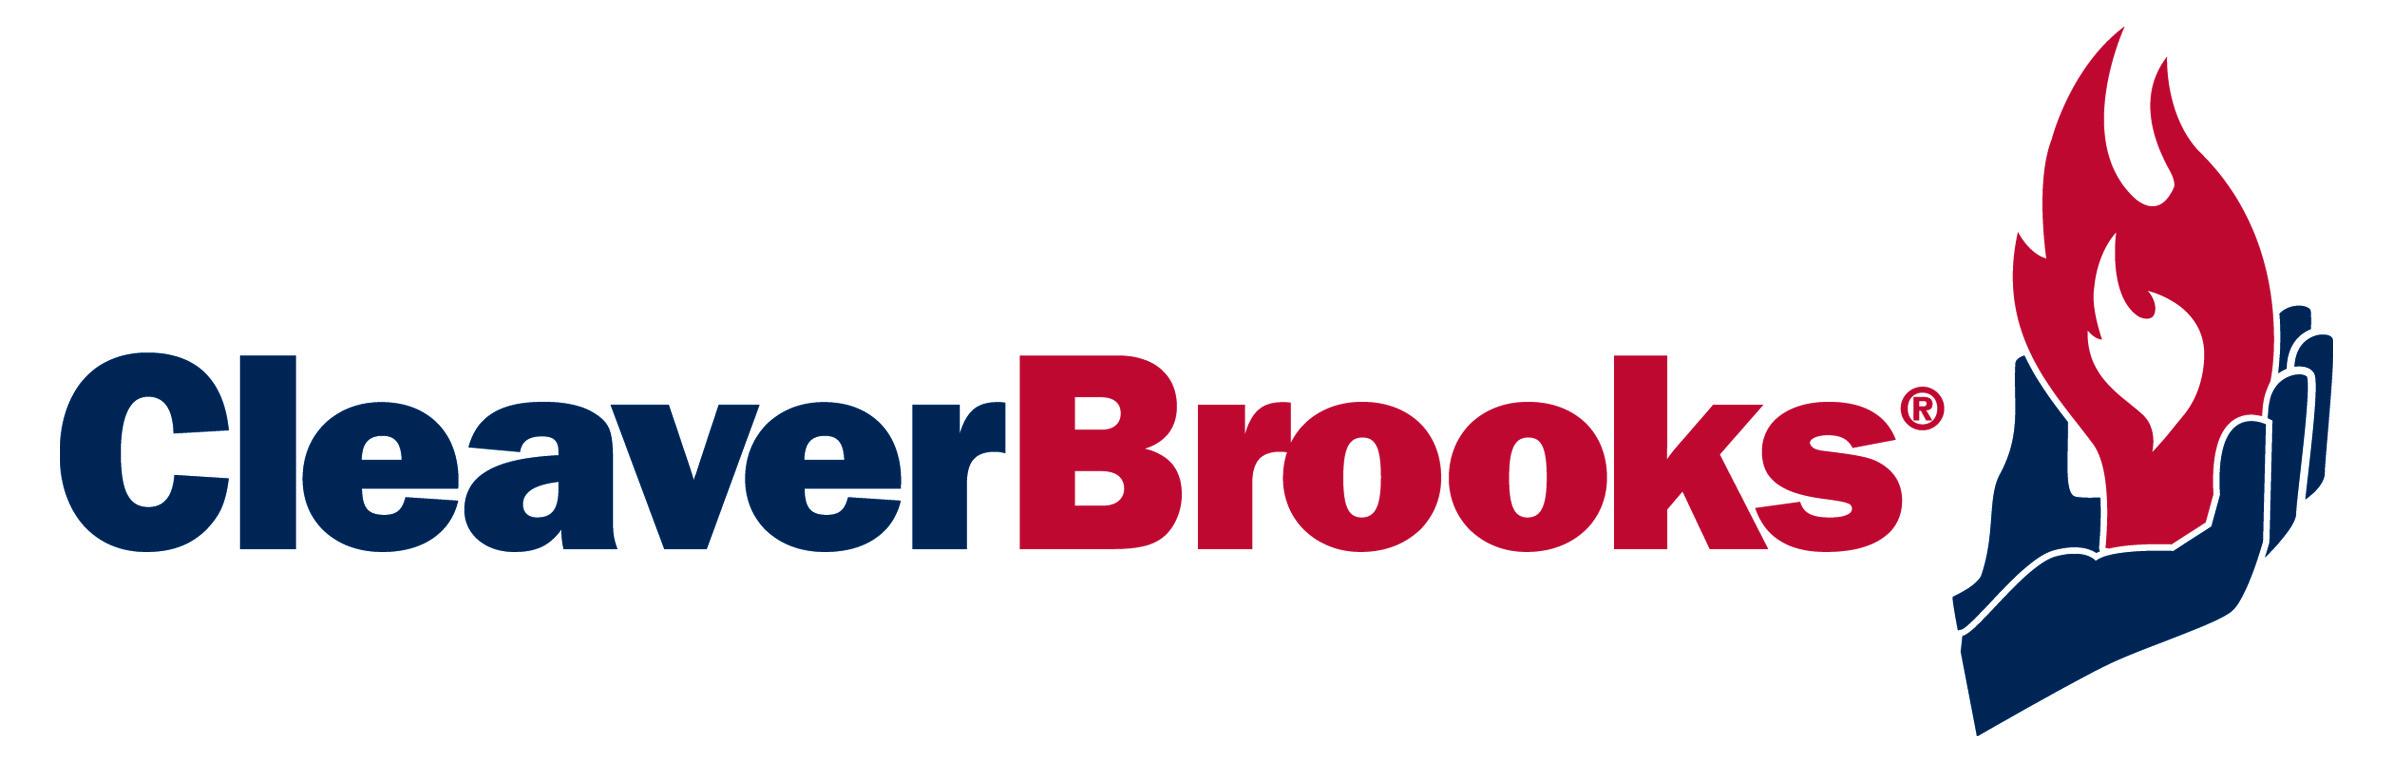 Cleaver Brooks of Canada Ltd.